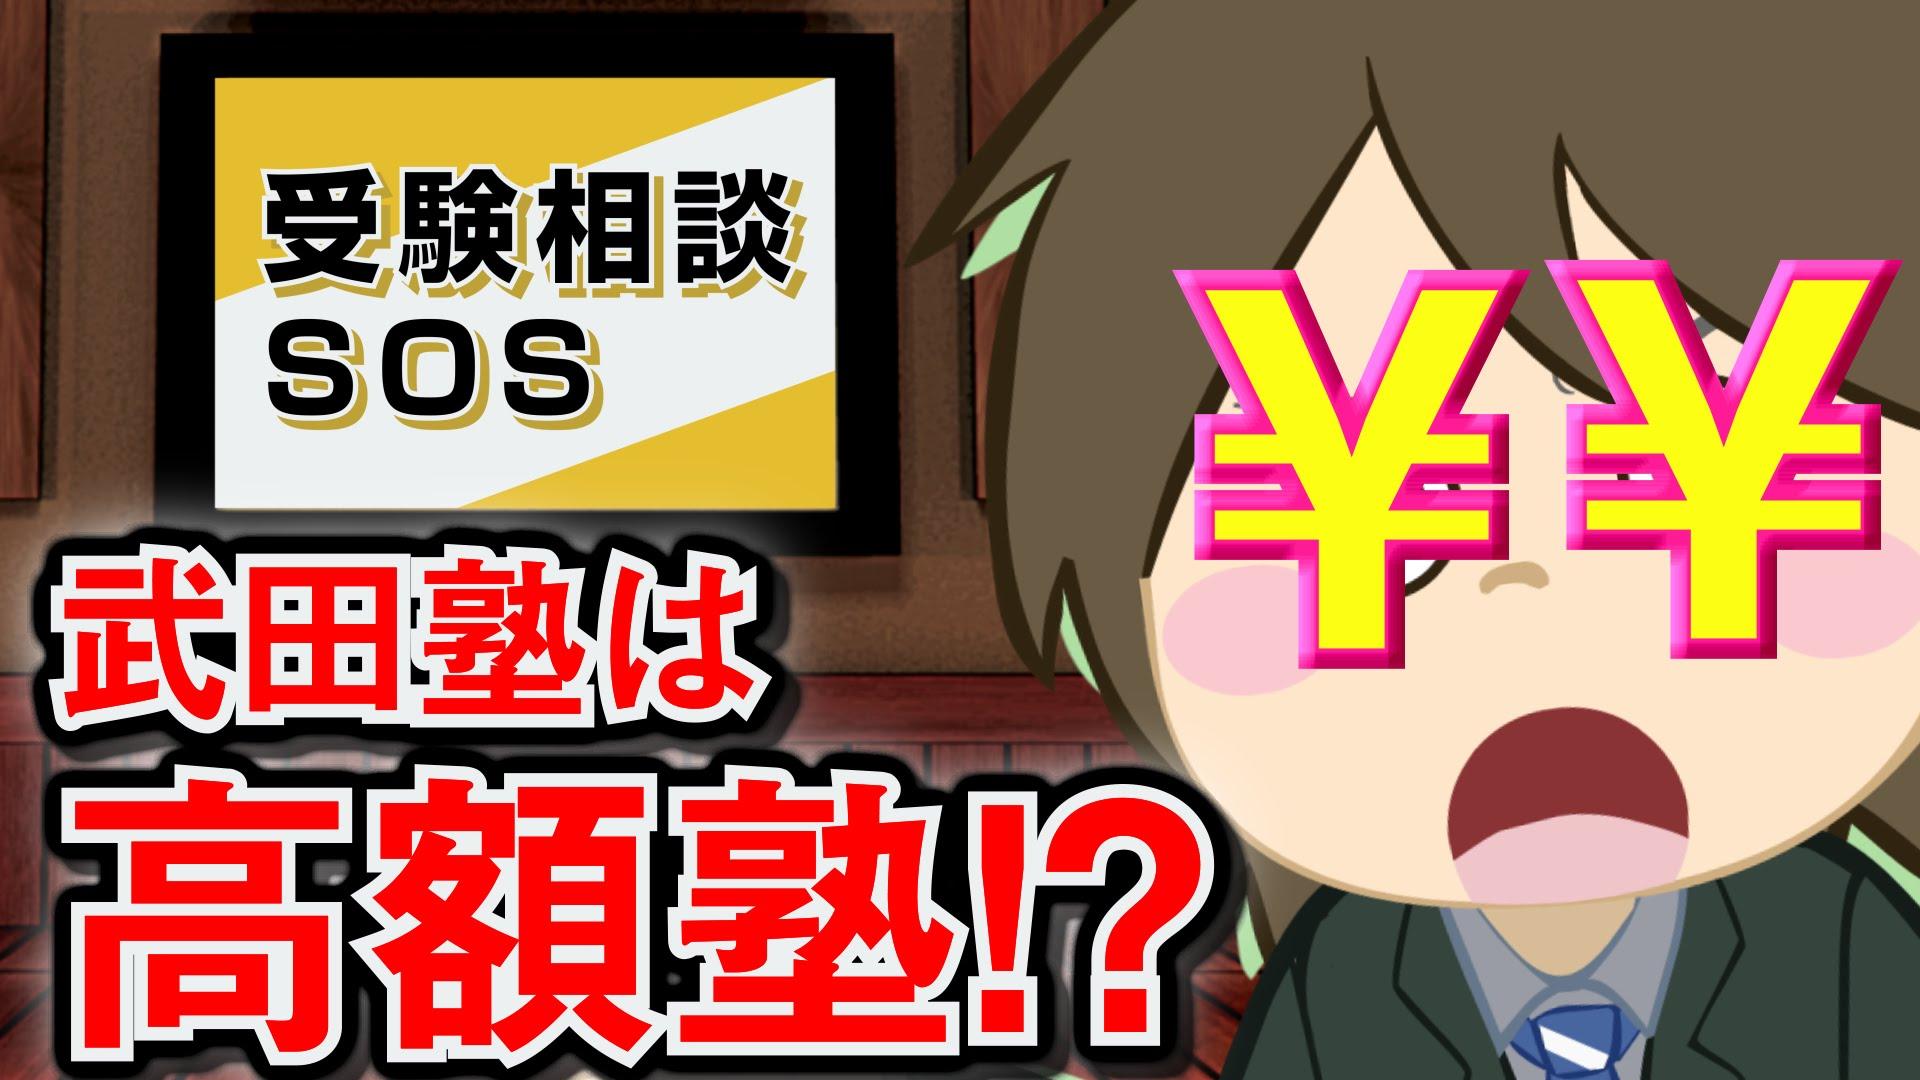 【vol.55】武田塾は高額塾!?武田塾っていくらかかる?|受験相談SOS